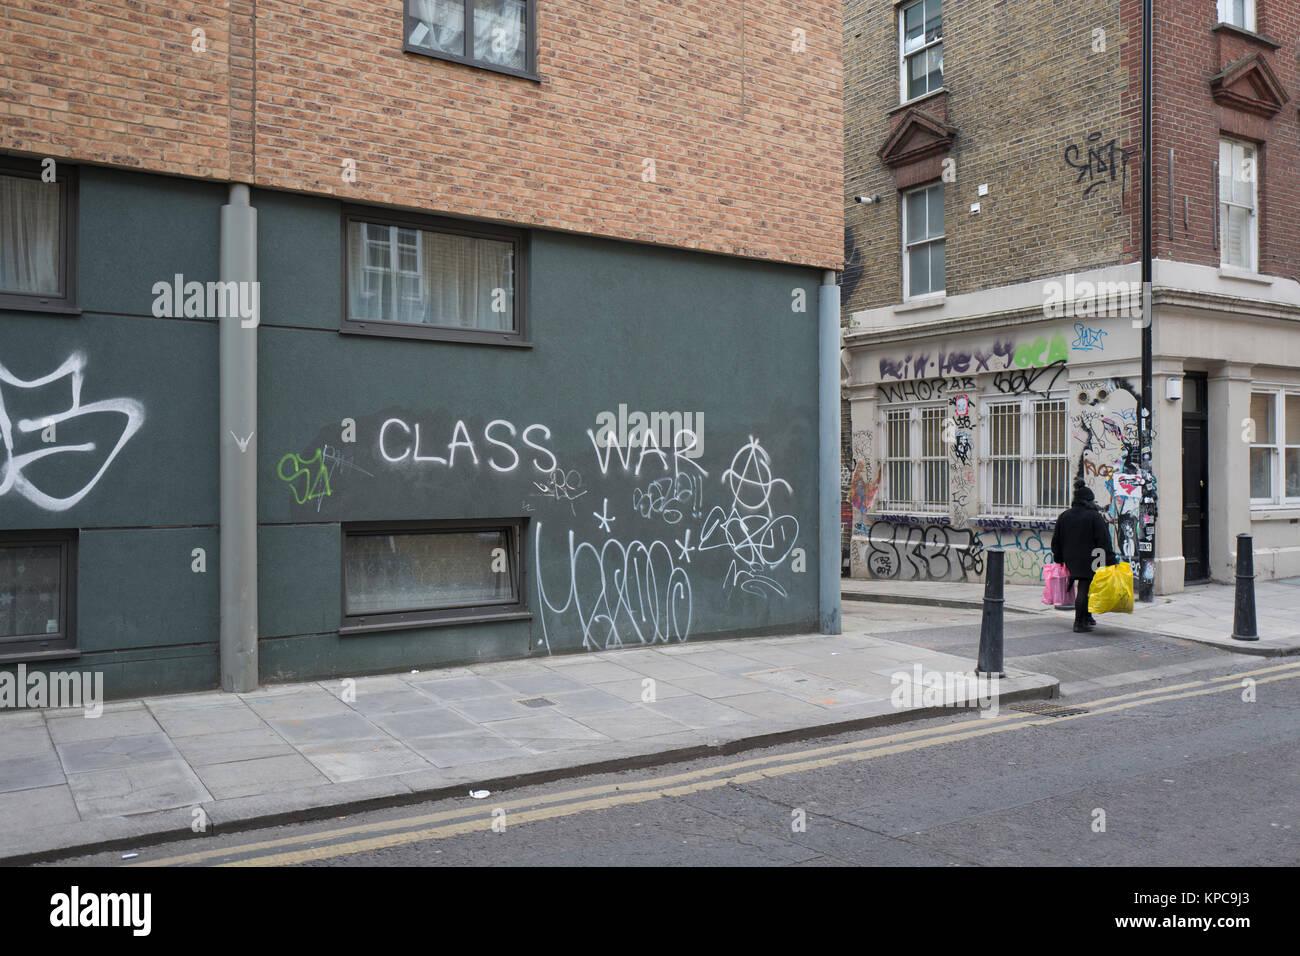 Class War graffiti on Cheshire Street in Spitalfields, near Whitechapel in the East End of London - Stock Image